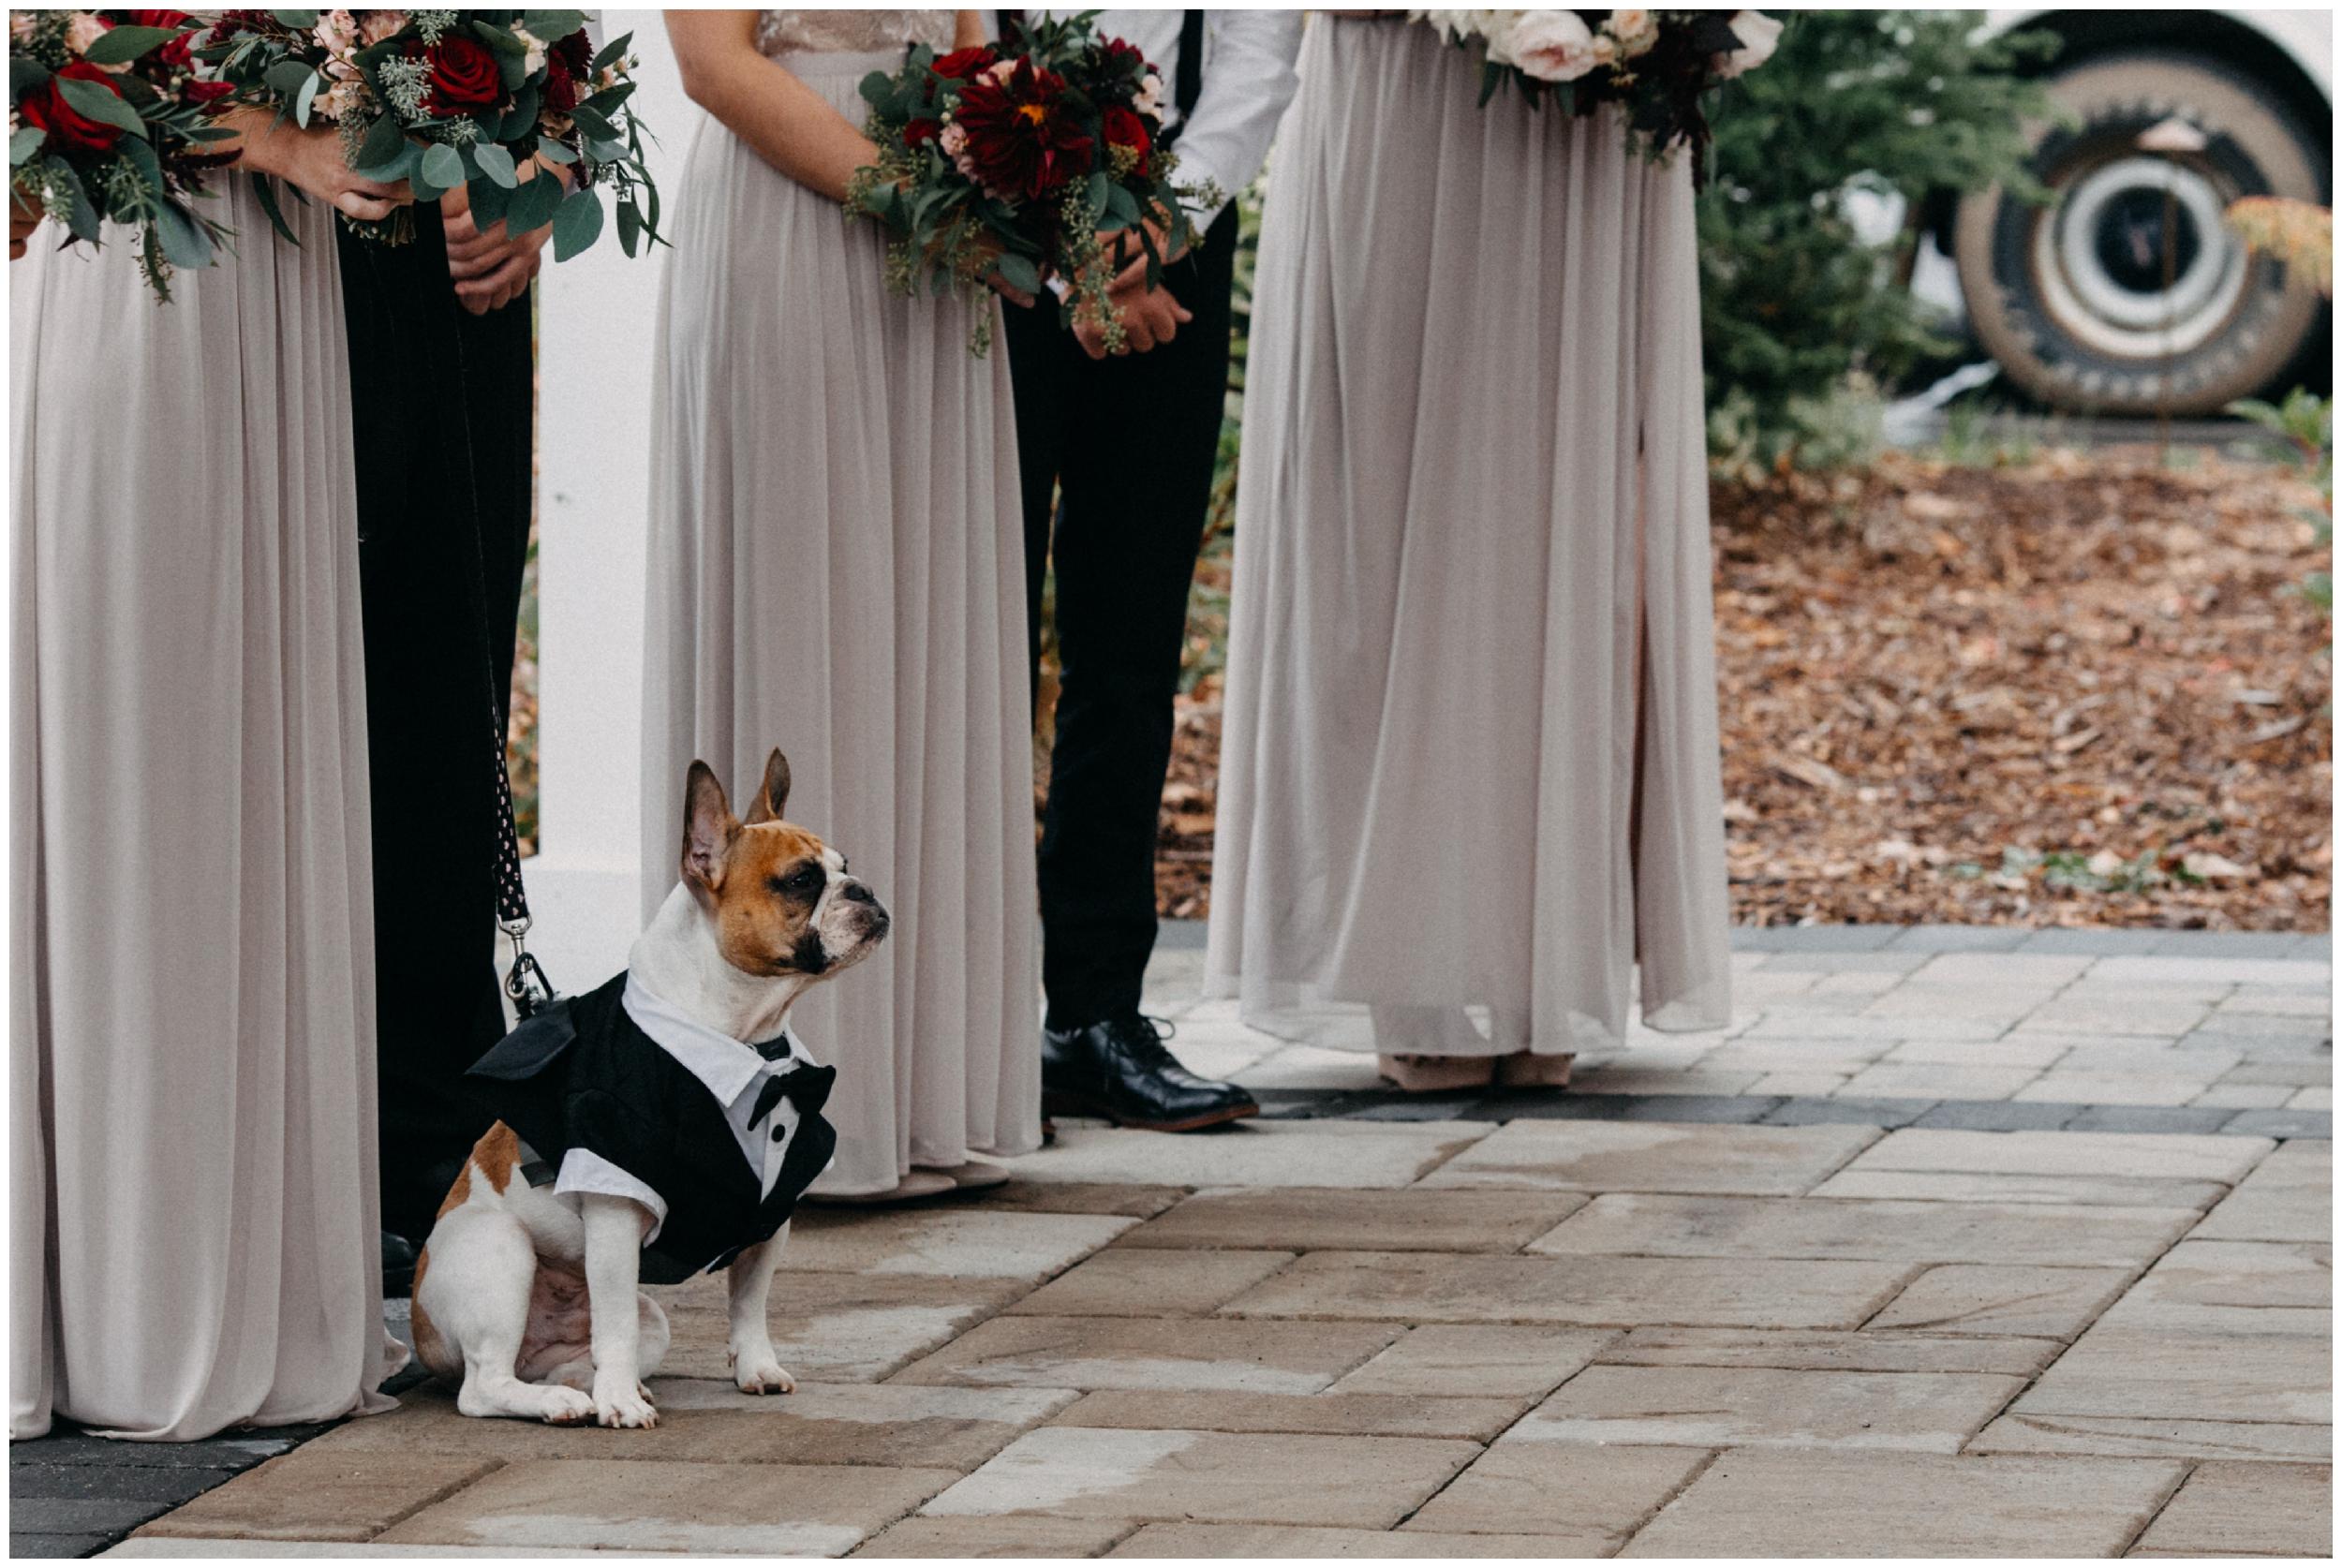 Adorable french bull dog in tuxedo at Quarterdeck Resort outdoor wedding ceremony